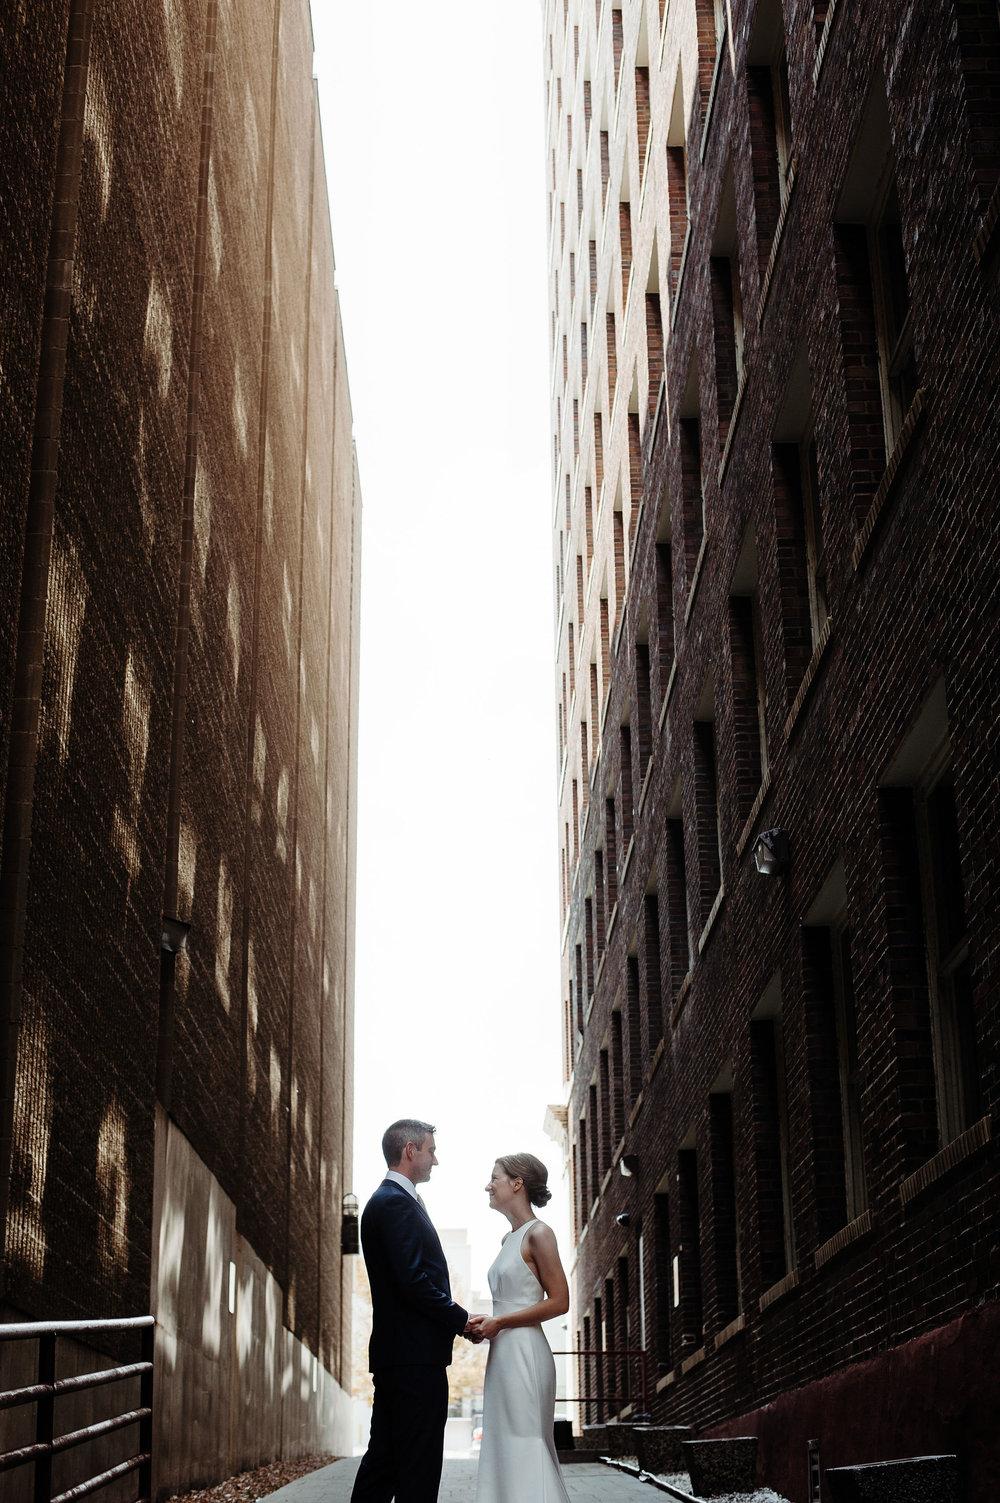 Alyssa+EvanWeddingPhotos-51.JPG